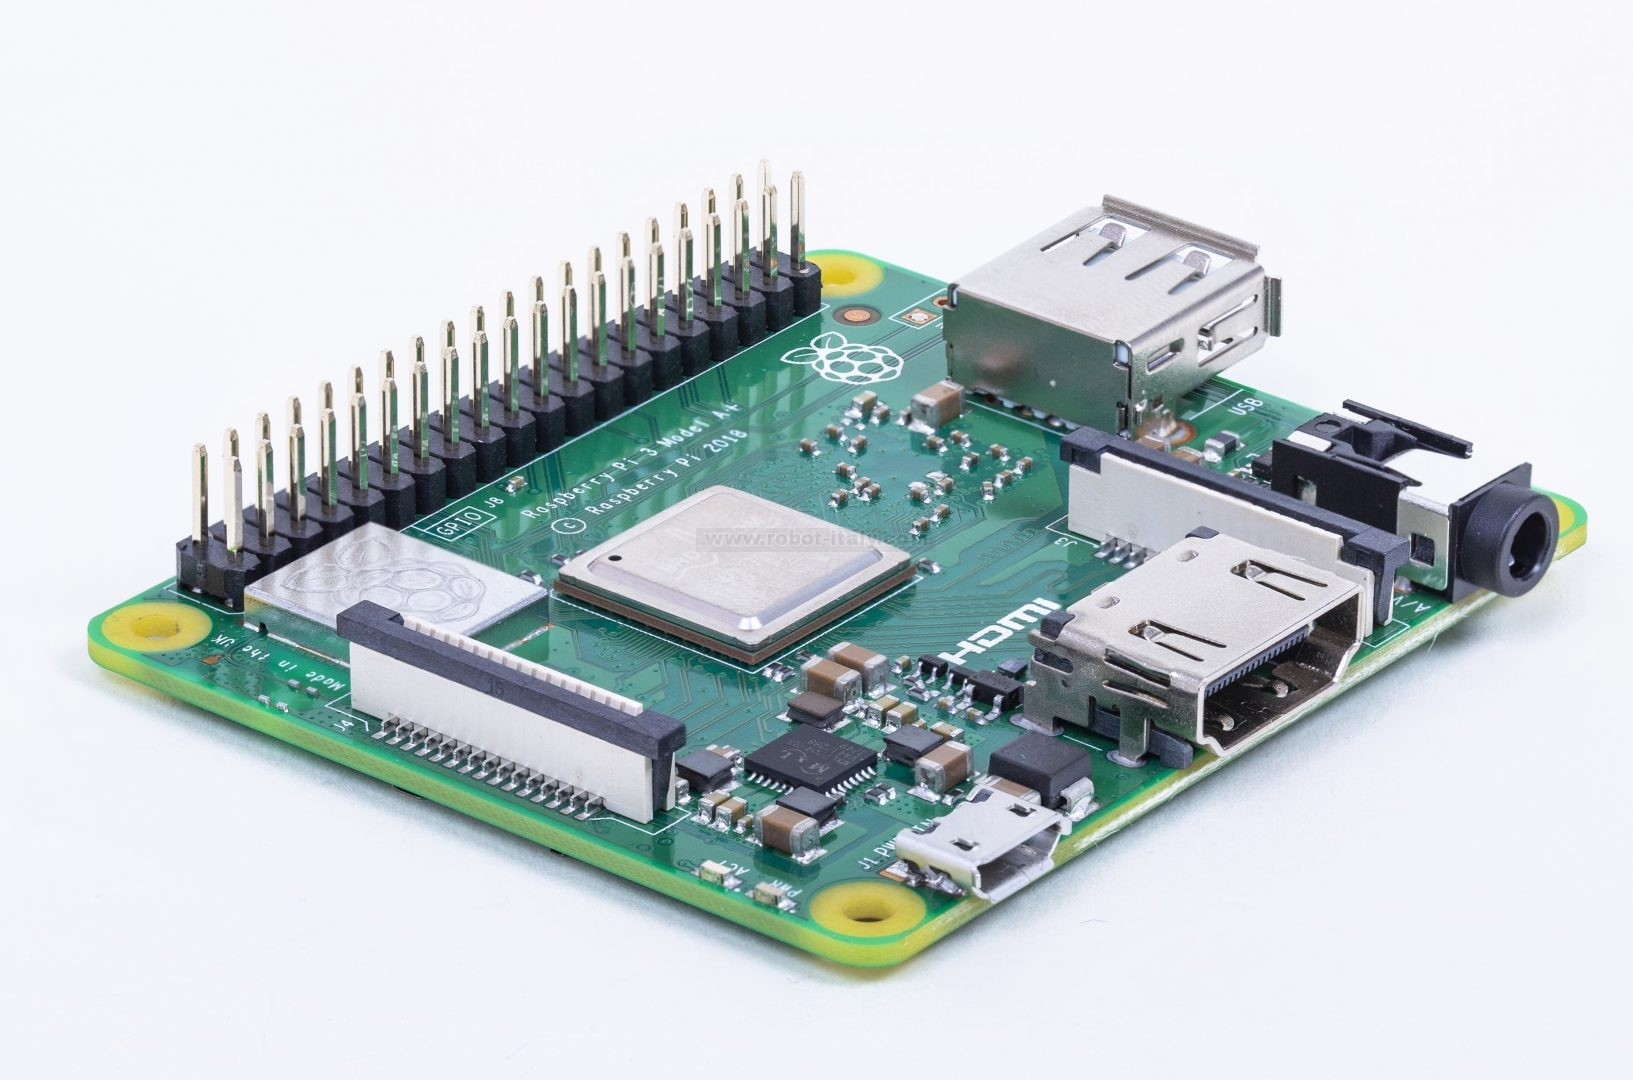 Raspberry Pi 3 Model A+- 1 4GHz 64-bit quad-core processor